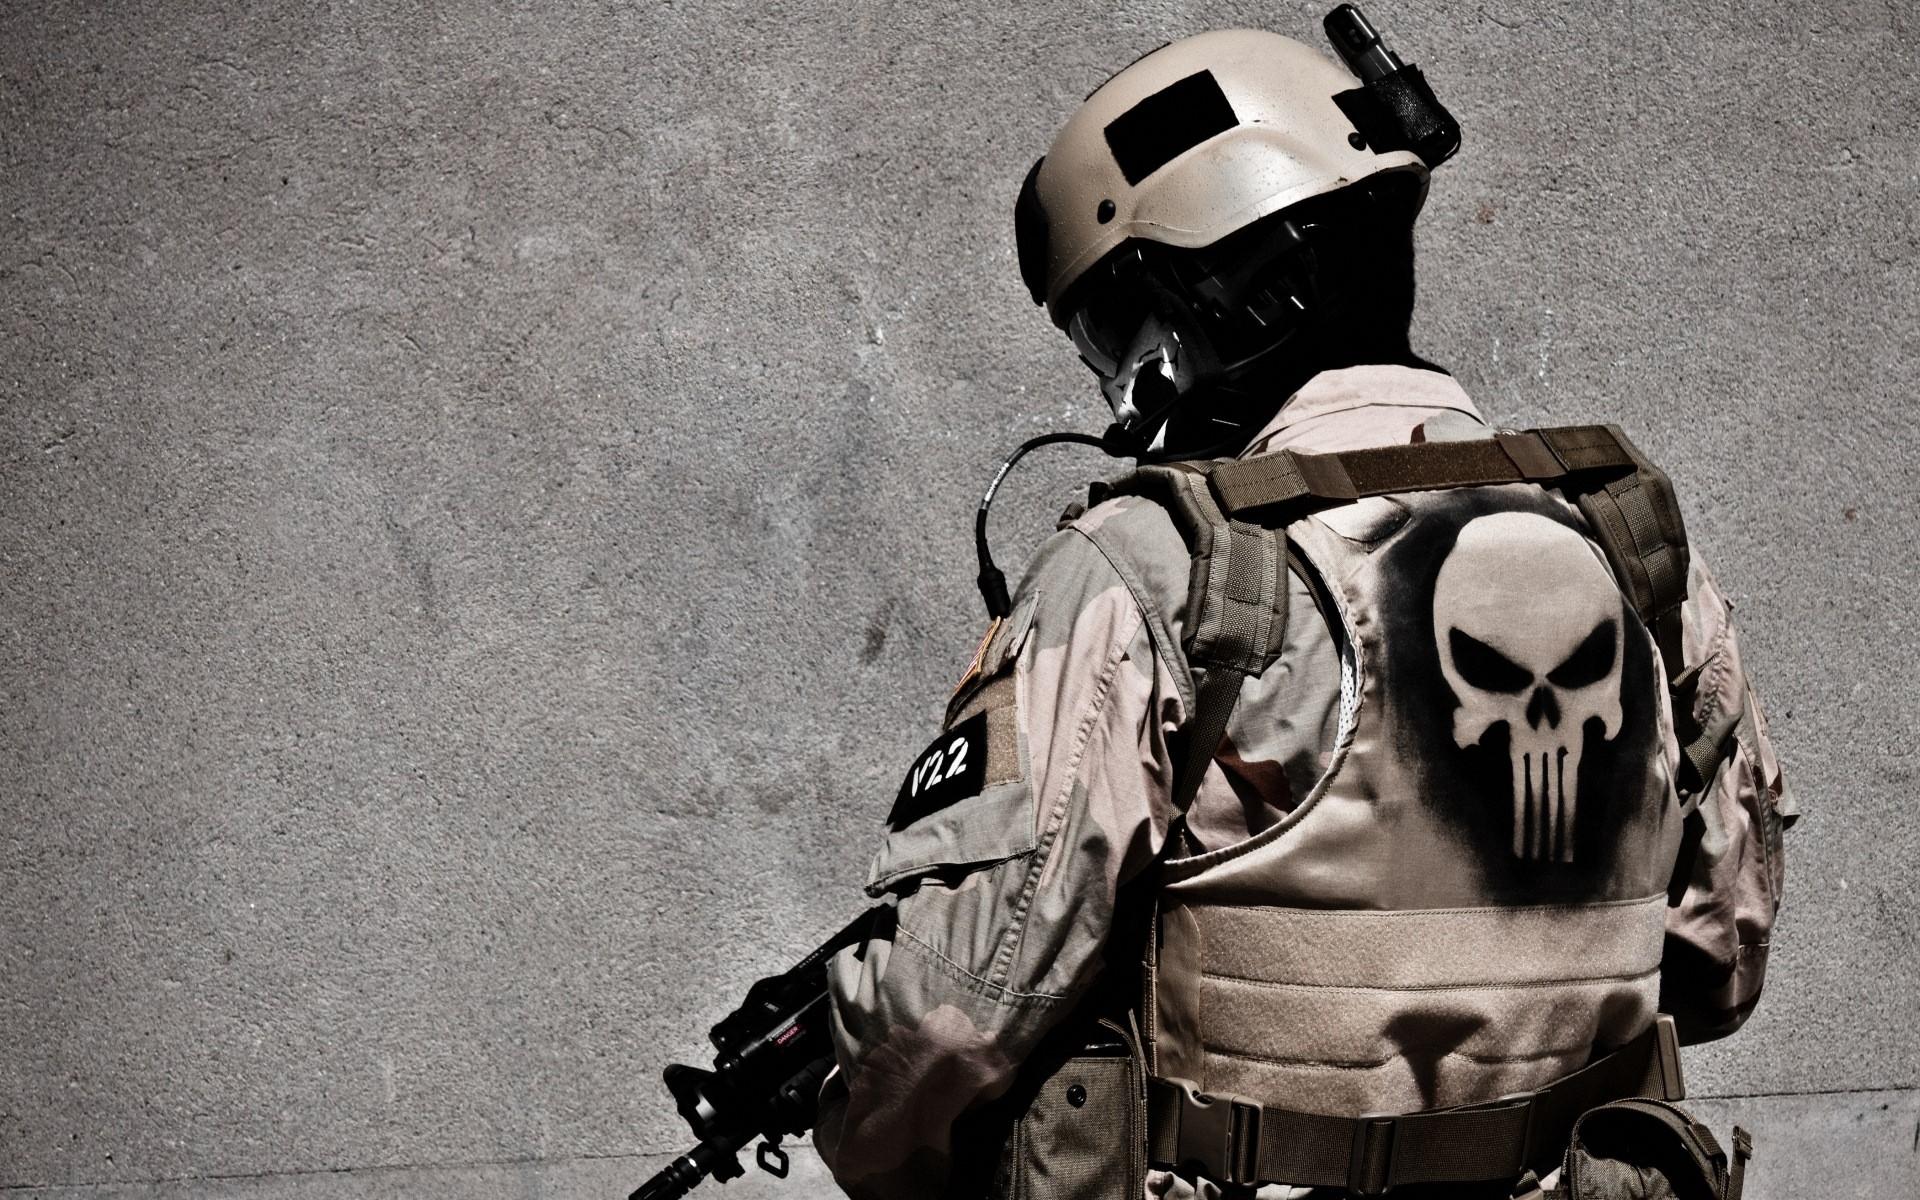 hdq pics, army - earline lyfield